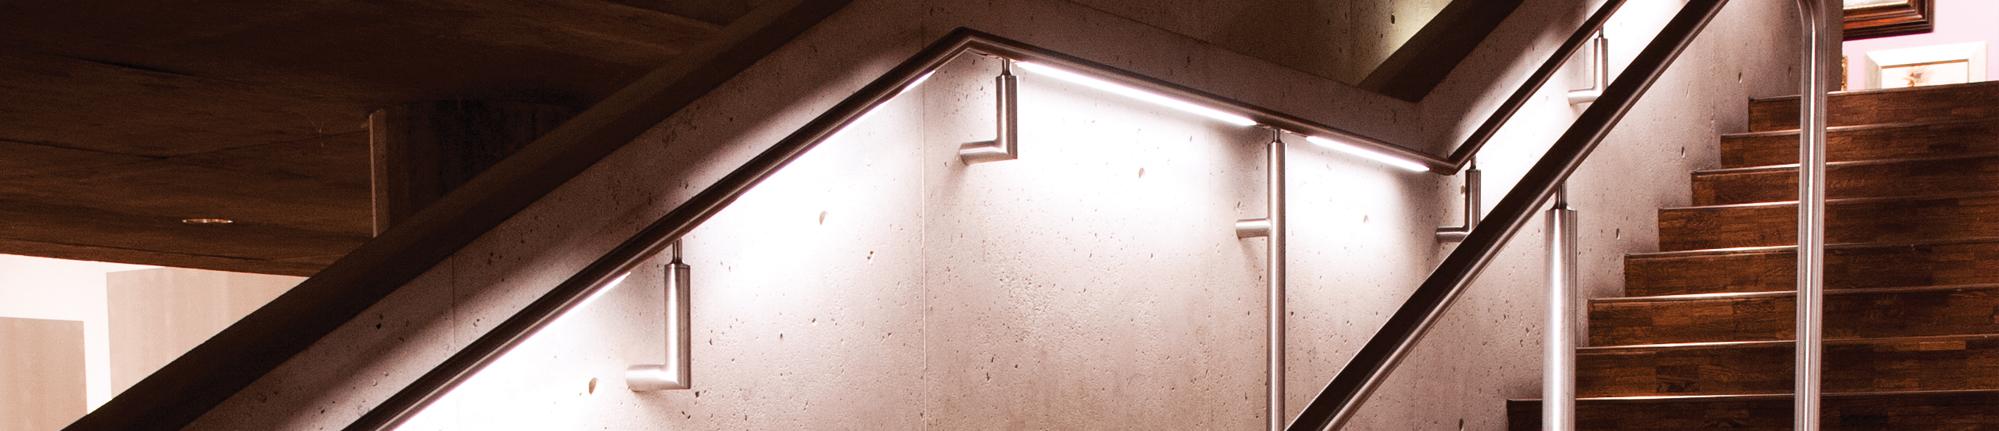 Railing Lights Lumenrail Amp Handrail Lighting Systems Wagner